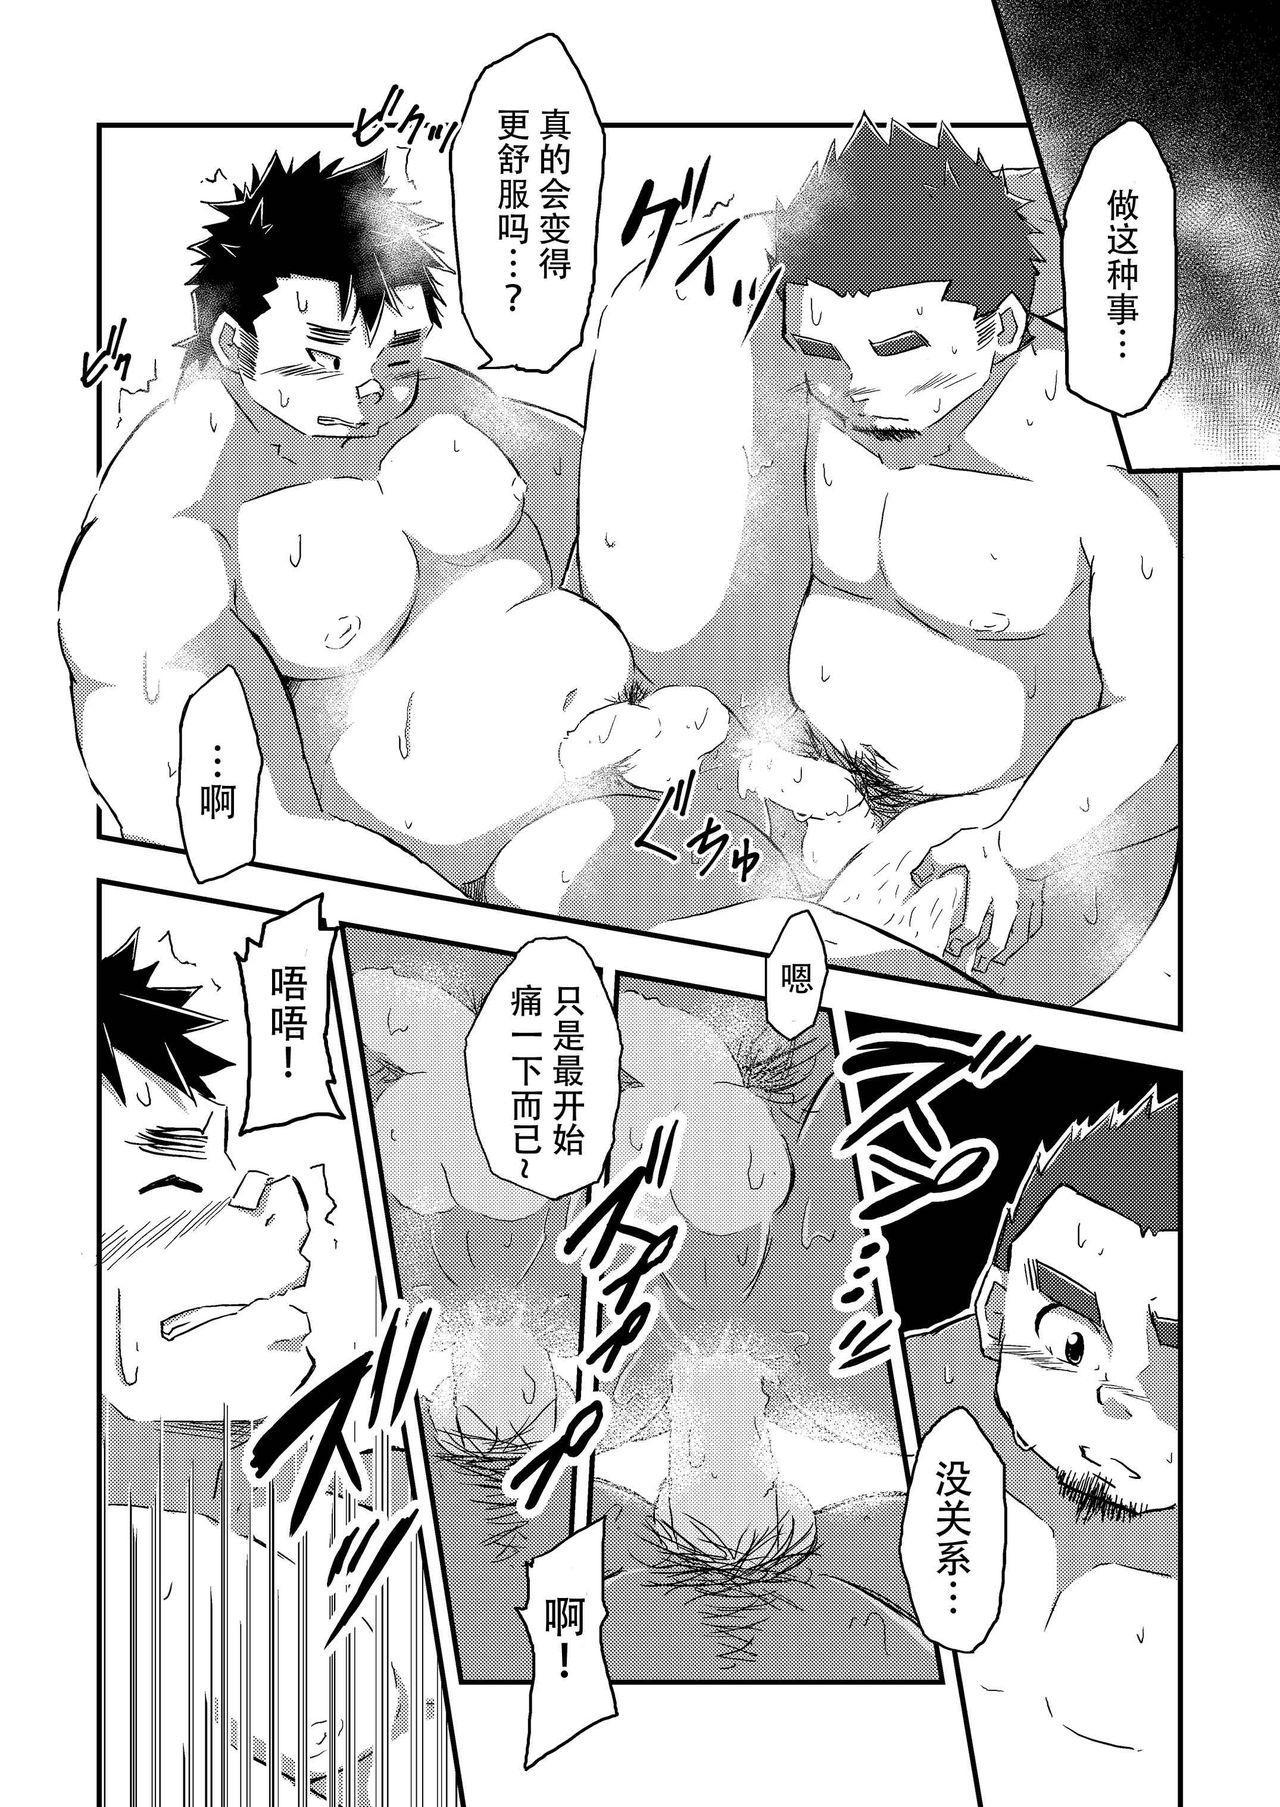 [CorkBOX (ngng)] Ise-kun wa Tamatte Iru. - Ise-kun is horny. [Chinese] {日曜日汉化} [Digital] 20